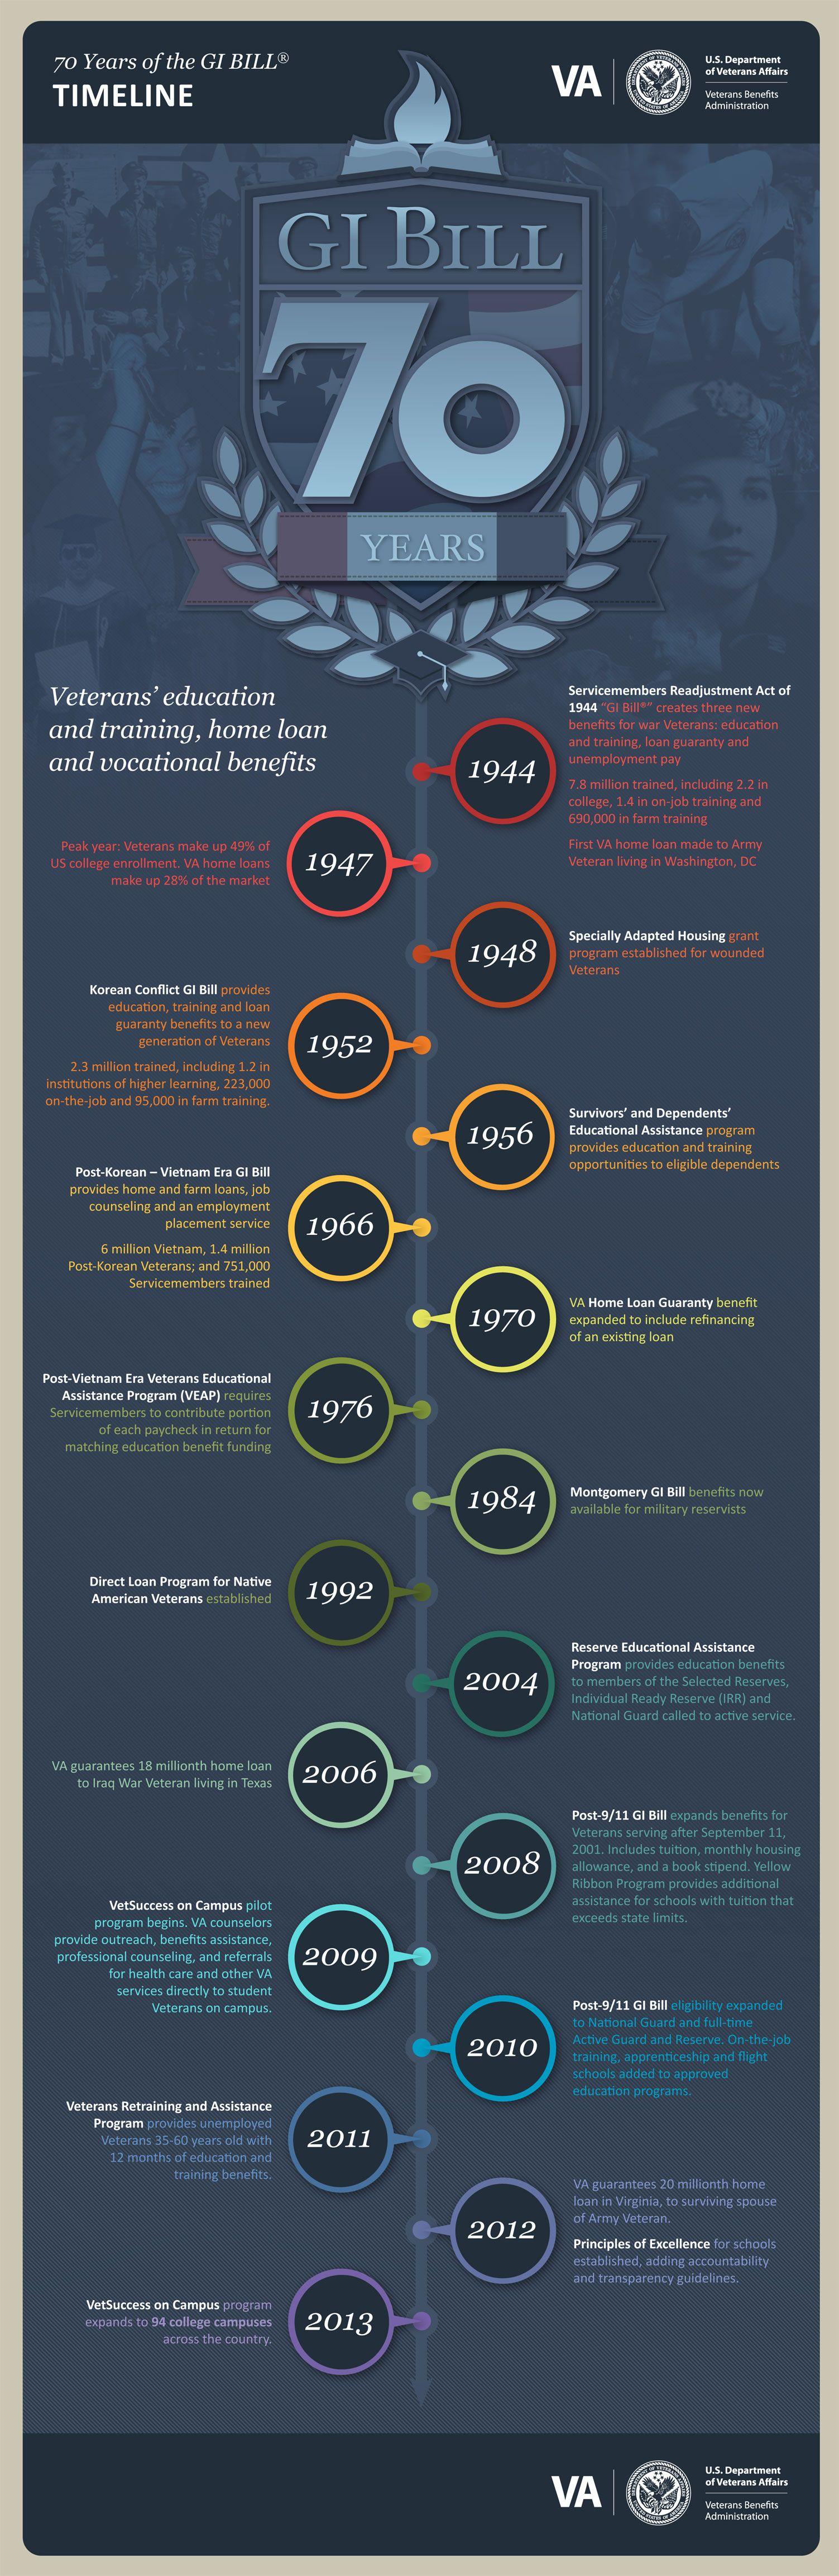 Gi bill housing allowance calculator - 70th Gi Bill Anniversary Infographic Timeline 70 Years Of The Gi Bill Veterans Education